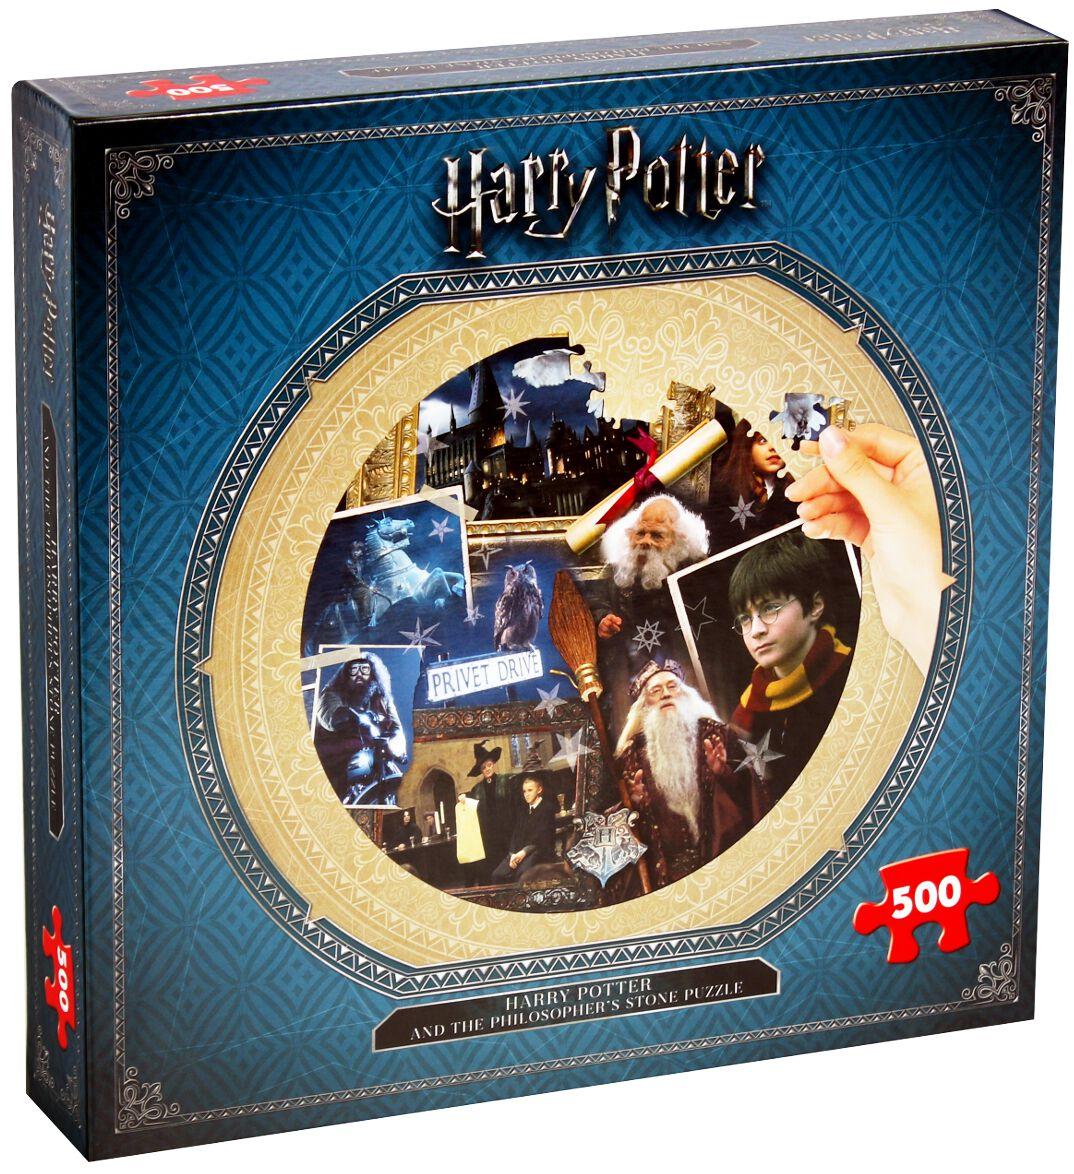 Harry Potter Philosophers Stone (500 Teile) Puzzle multicolor 002480